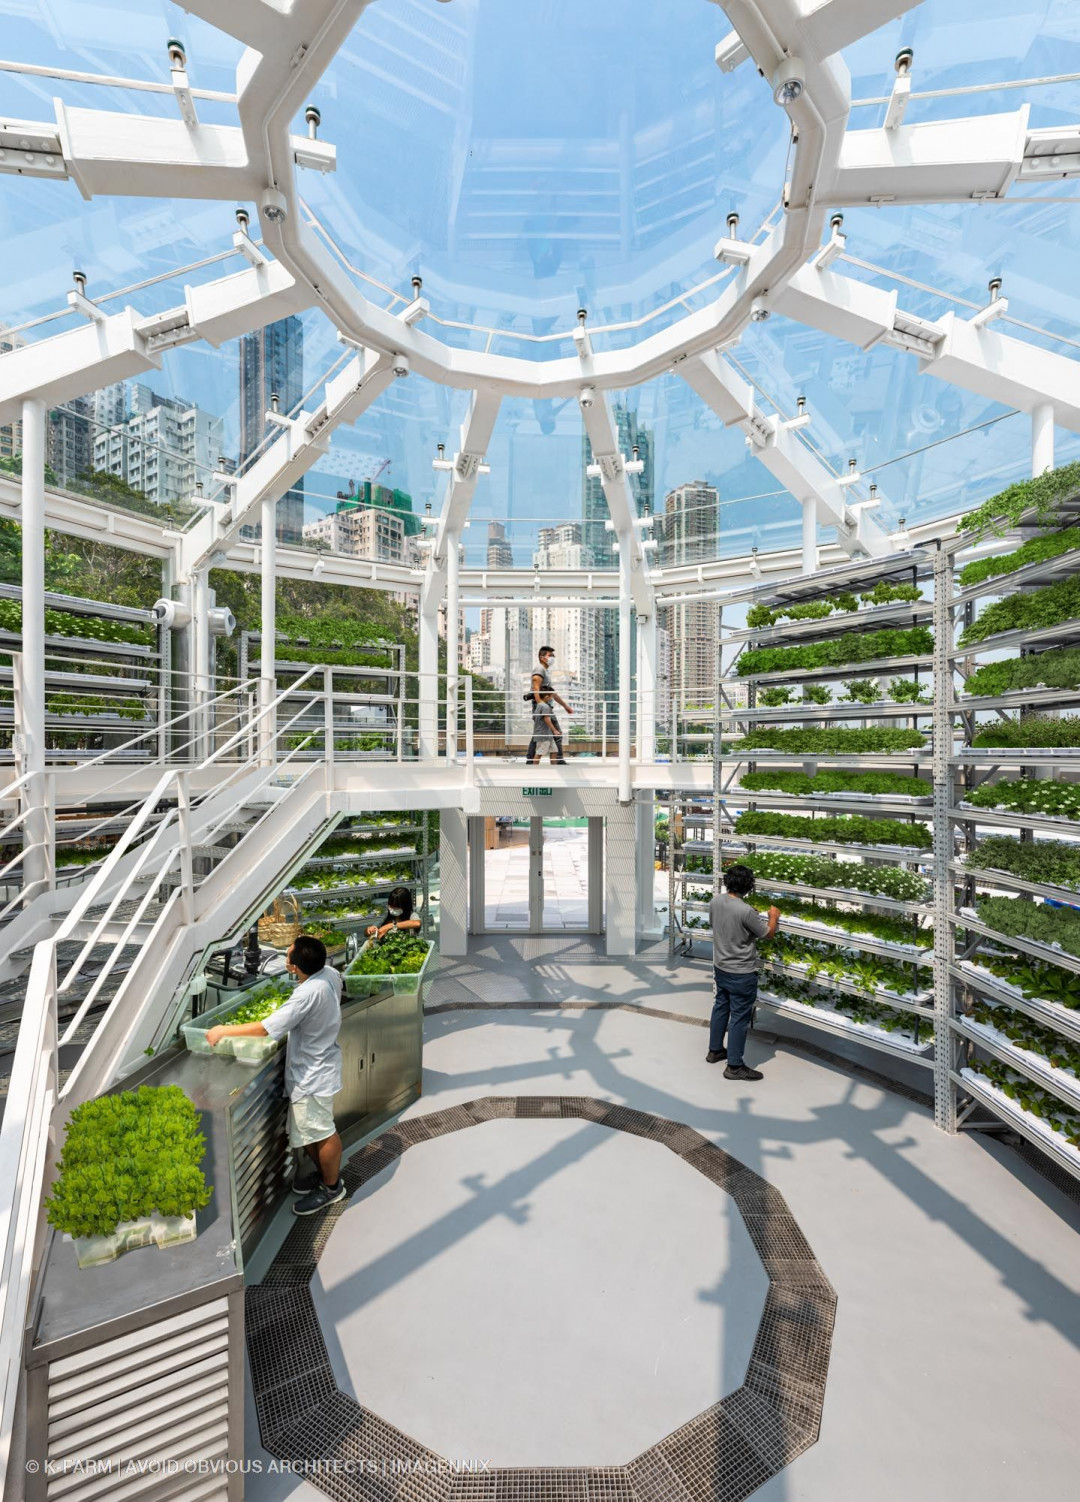 K-farm: Smart Urban Farming